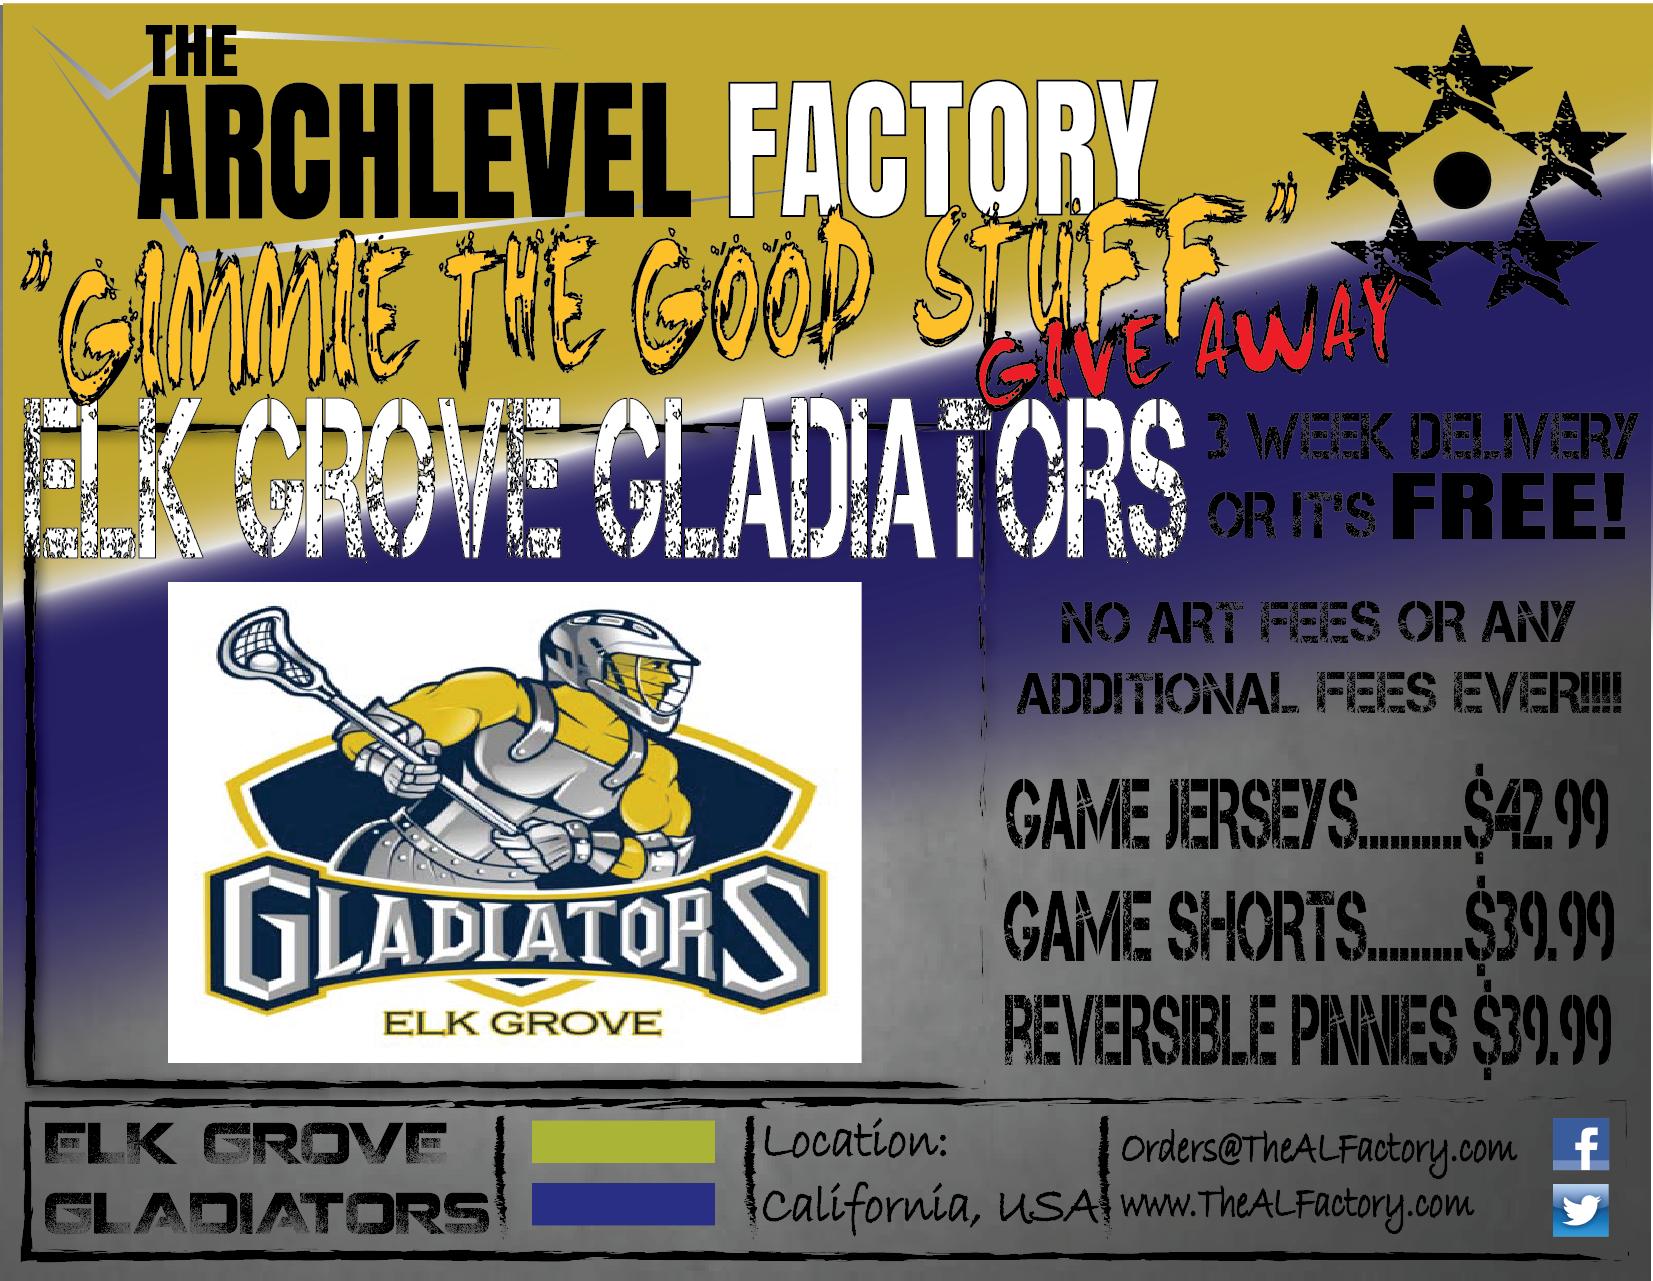 Elk Grove Gladiators